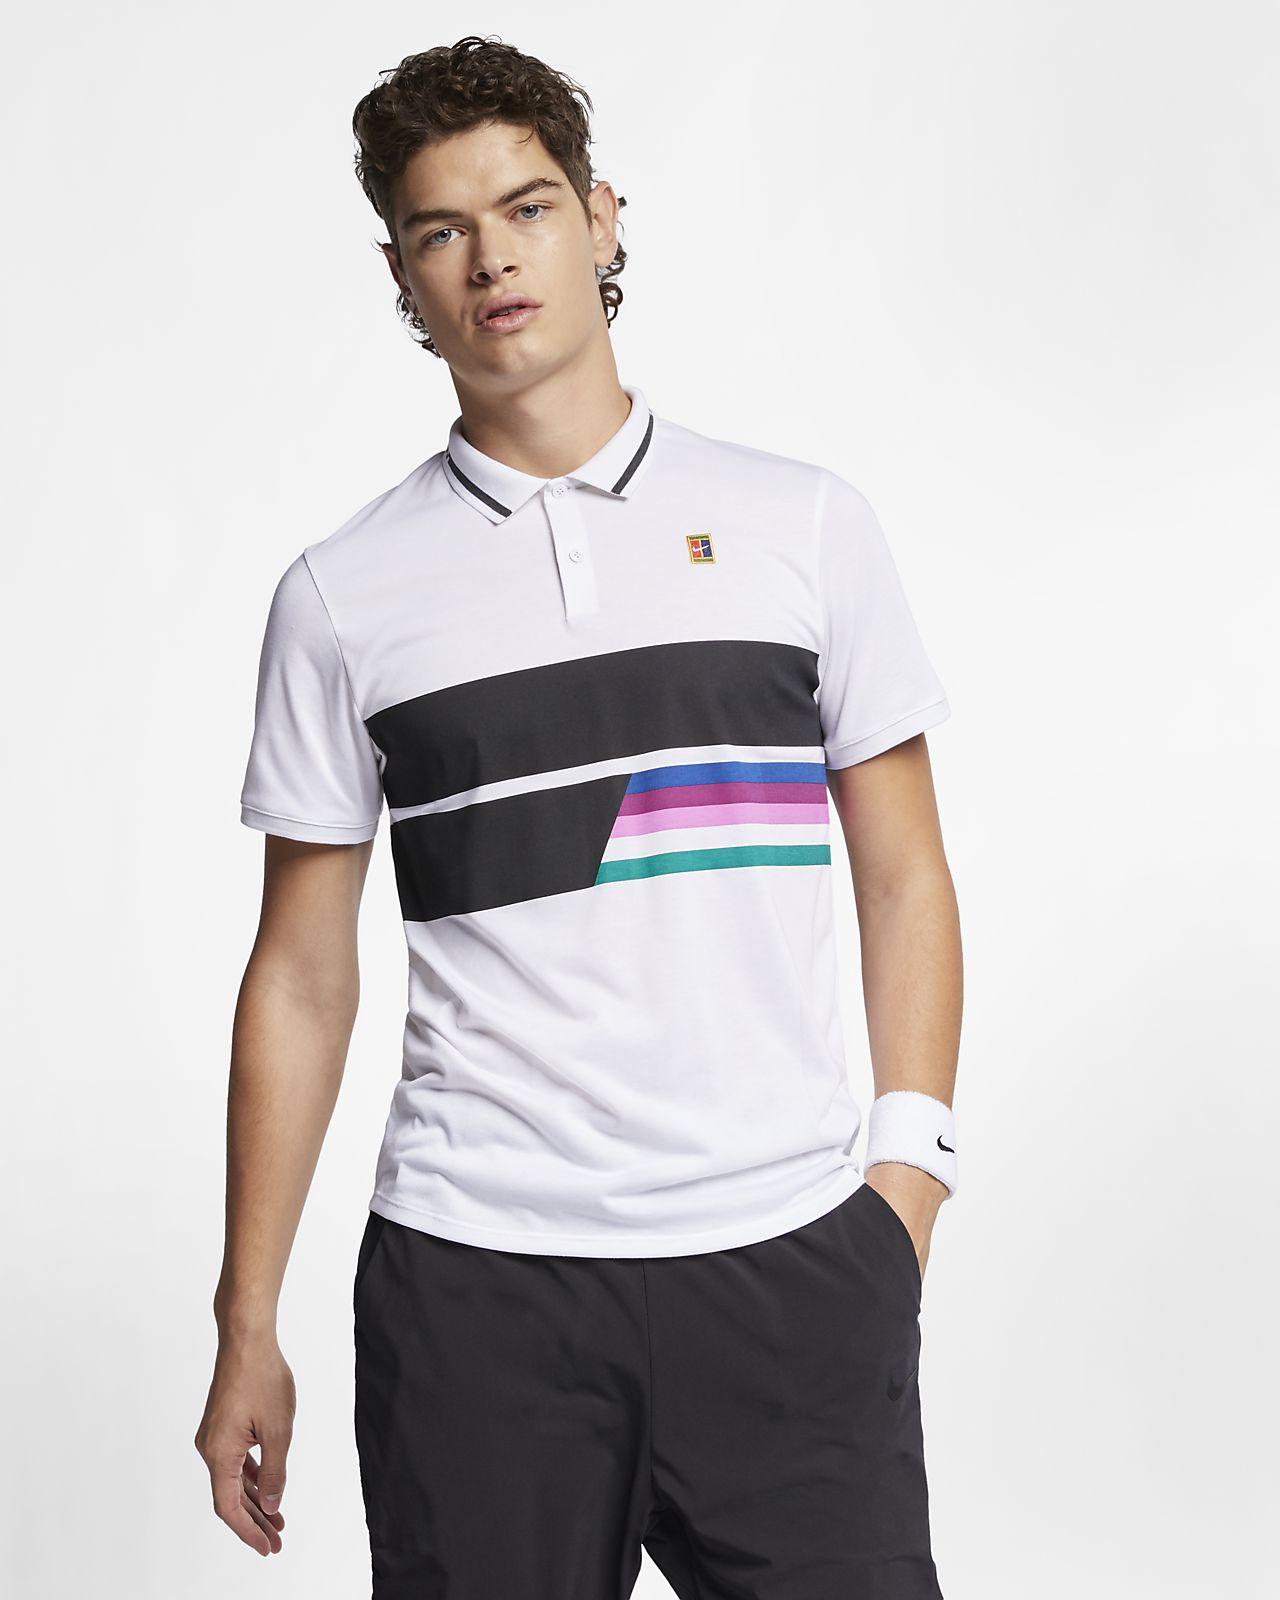 new style b9b13 bd3a2 ... Polo de tennis NikeCourt pour Homme